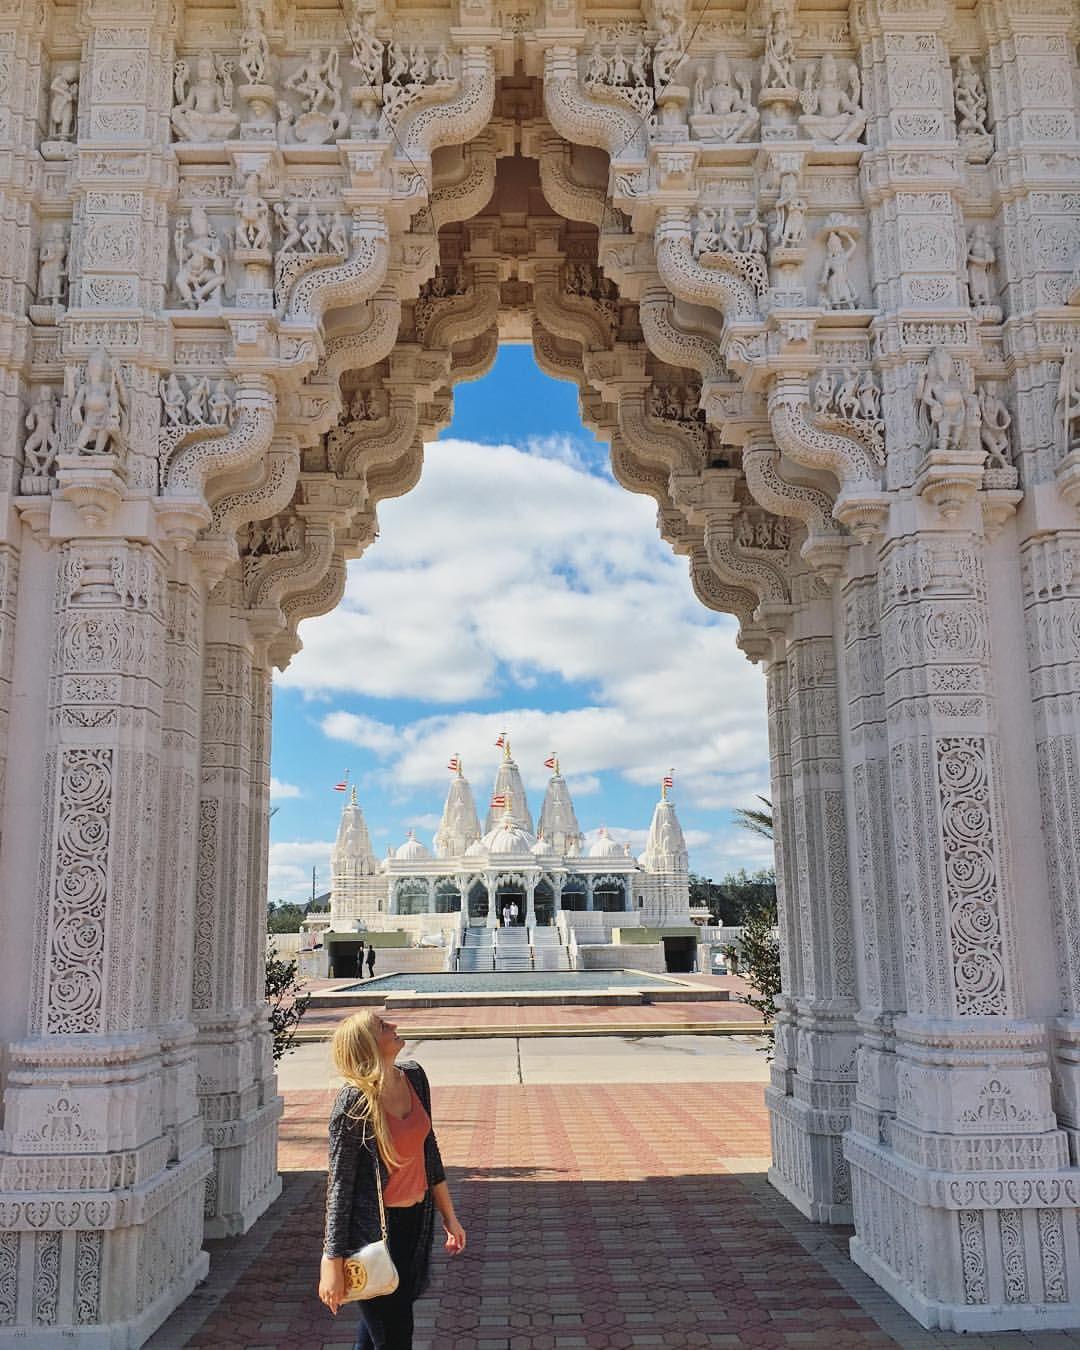 Temple Texas Traditional Home: BAPS Shri Swaminarayan Mandir Hindu Temple, Houston, Texas